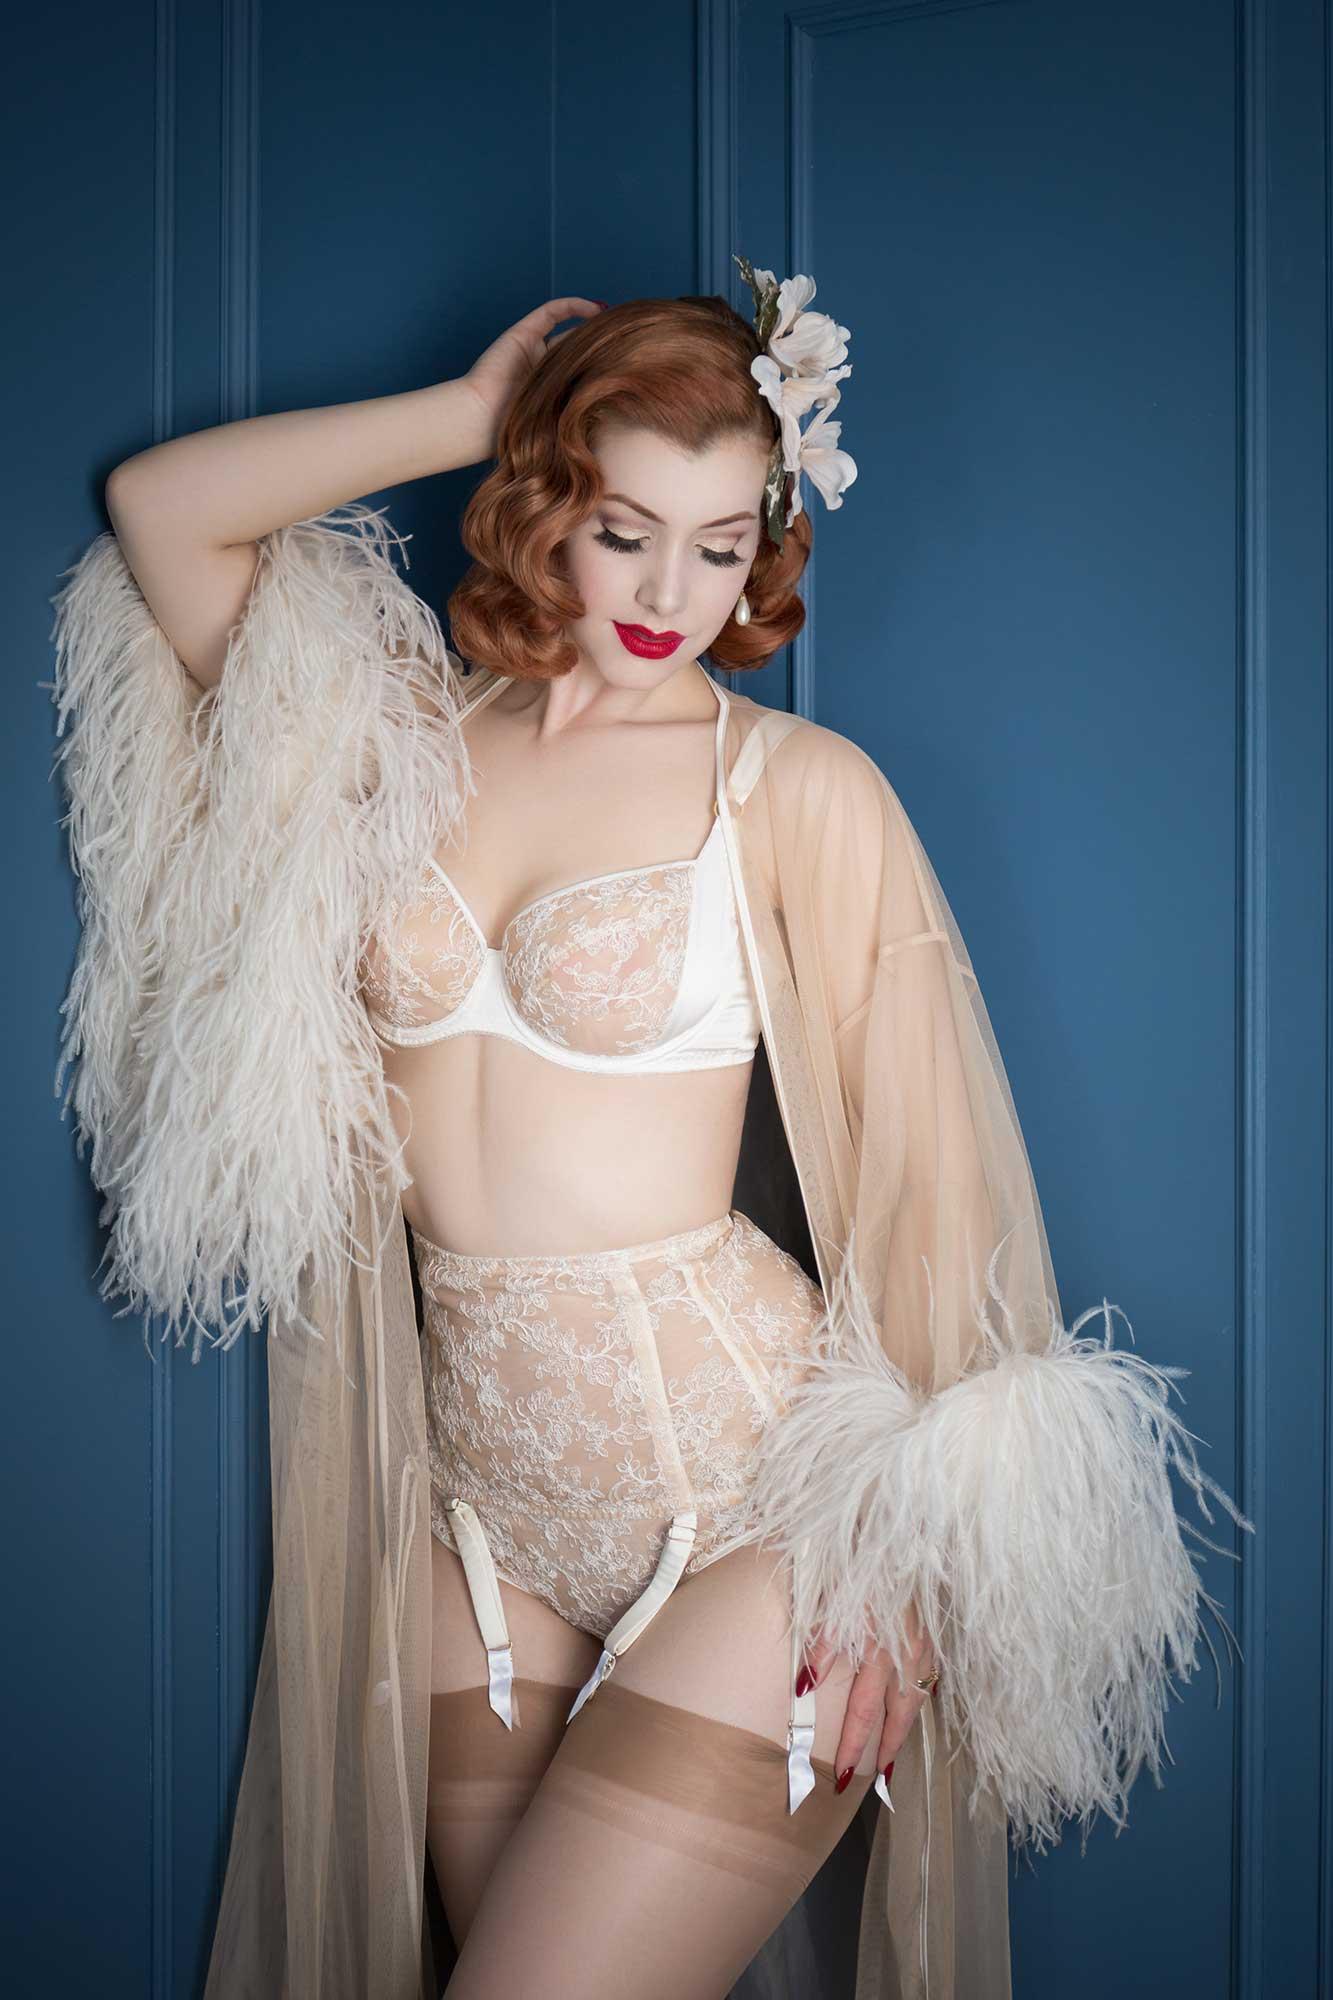 boudoir makeover photo shoot with Tigz Rice